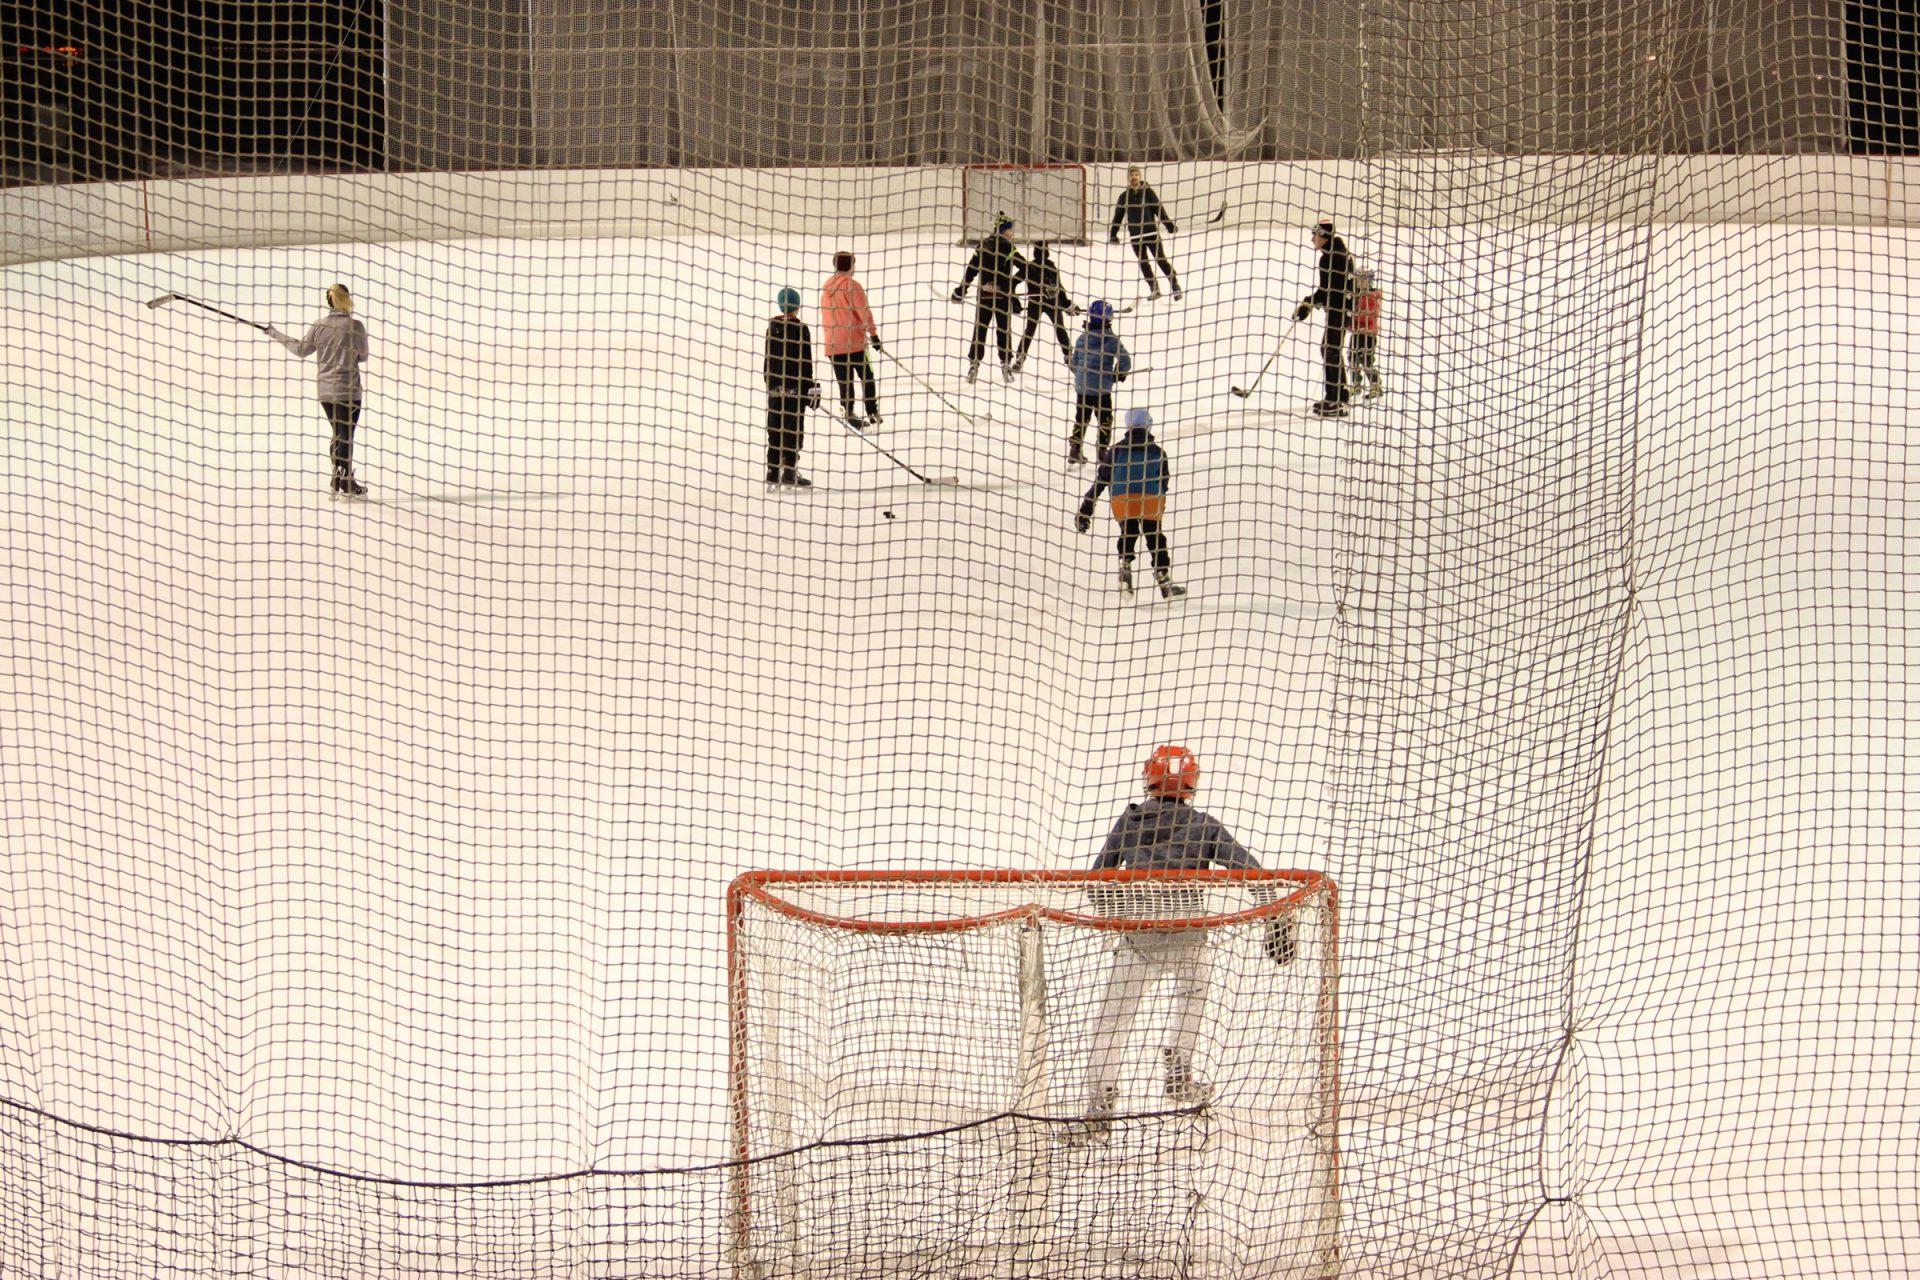 Kids Playing Hockey in Rink